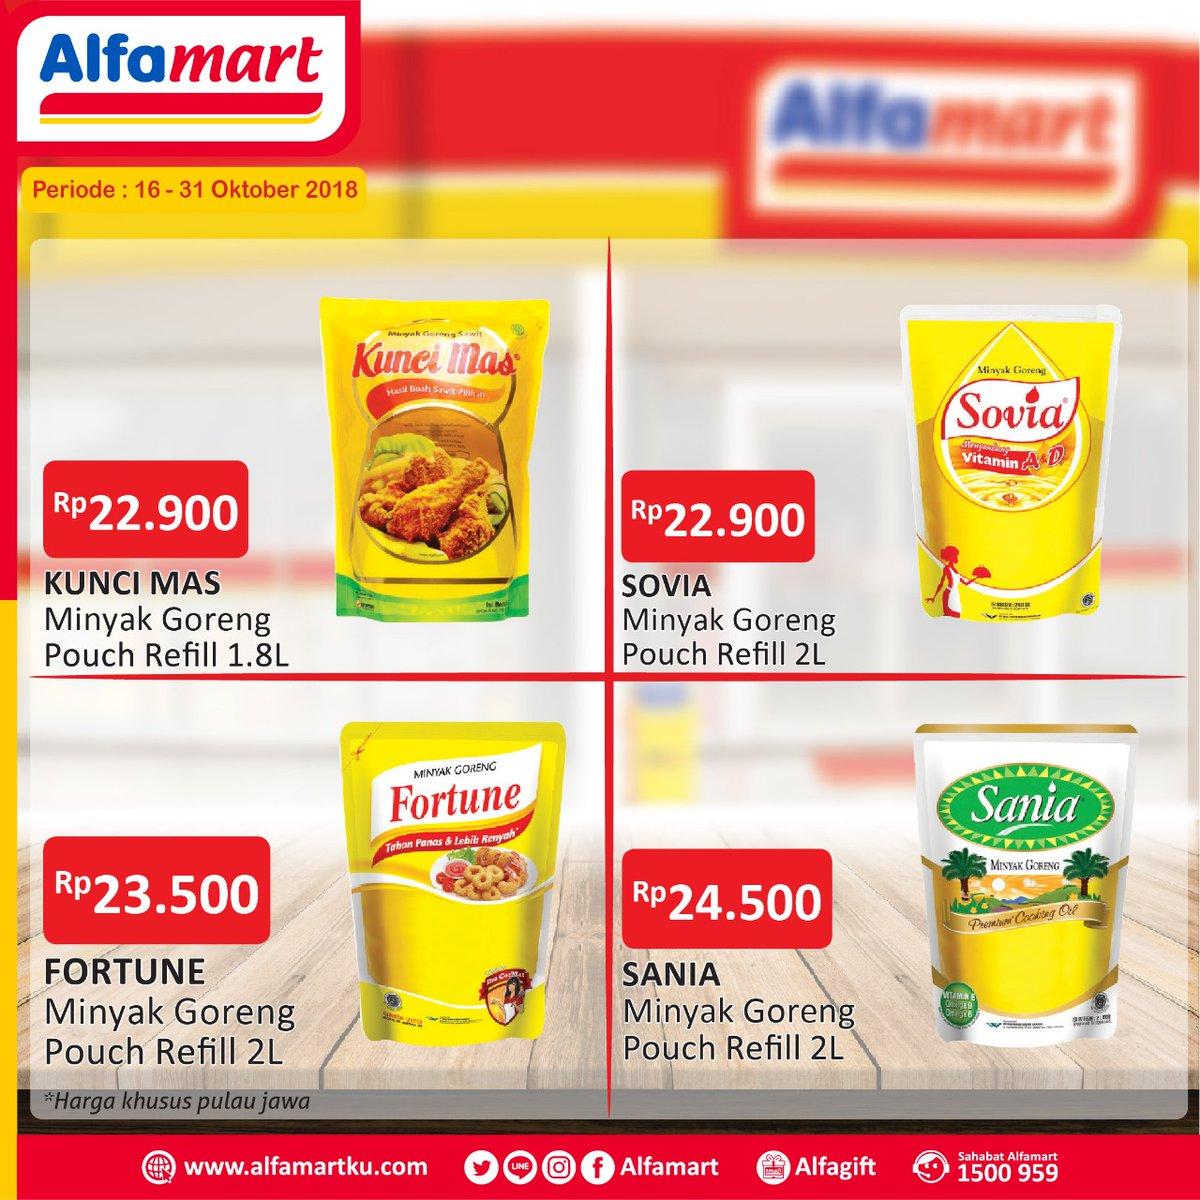 Alfamart - Promo Parade Minyak Goreng Murah (s.d 31 Okt 2018)